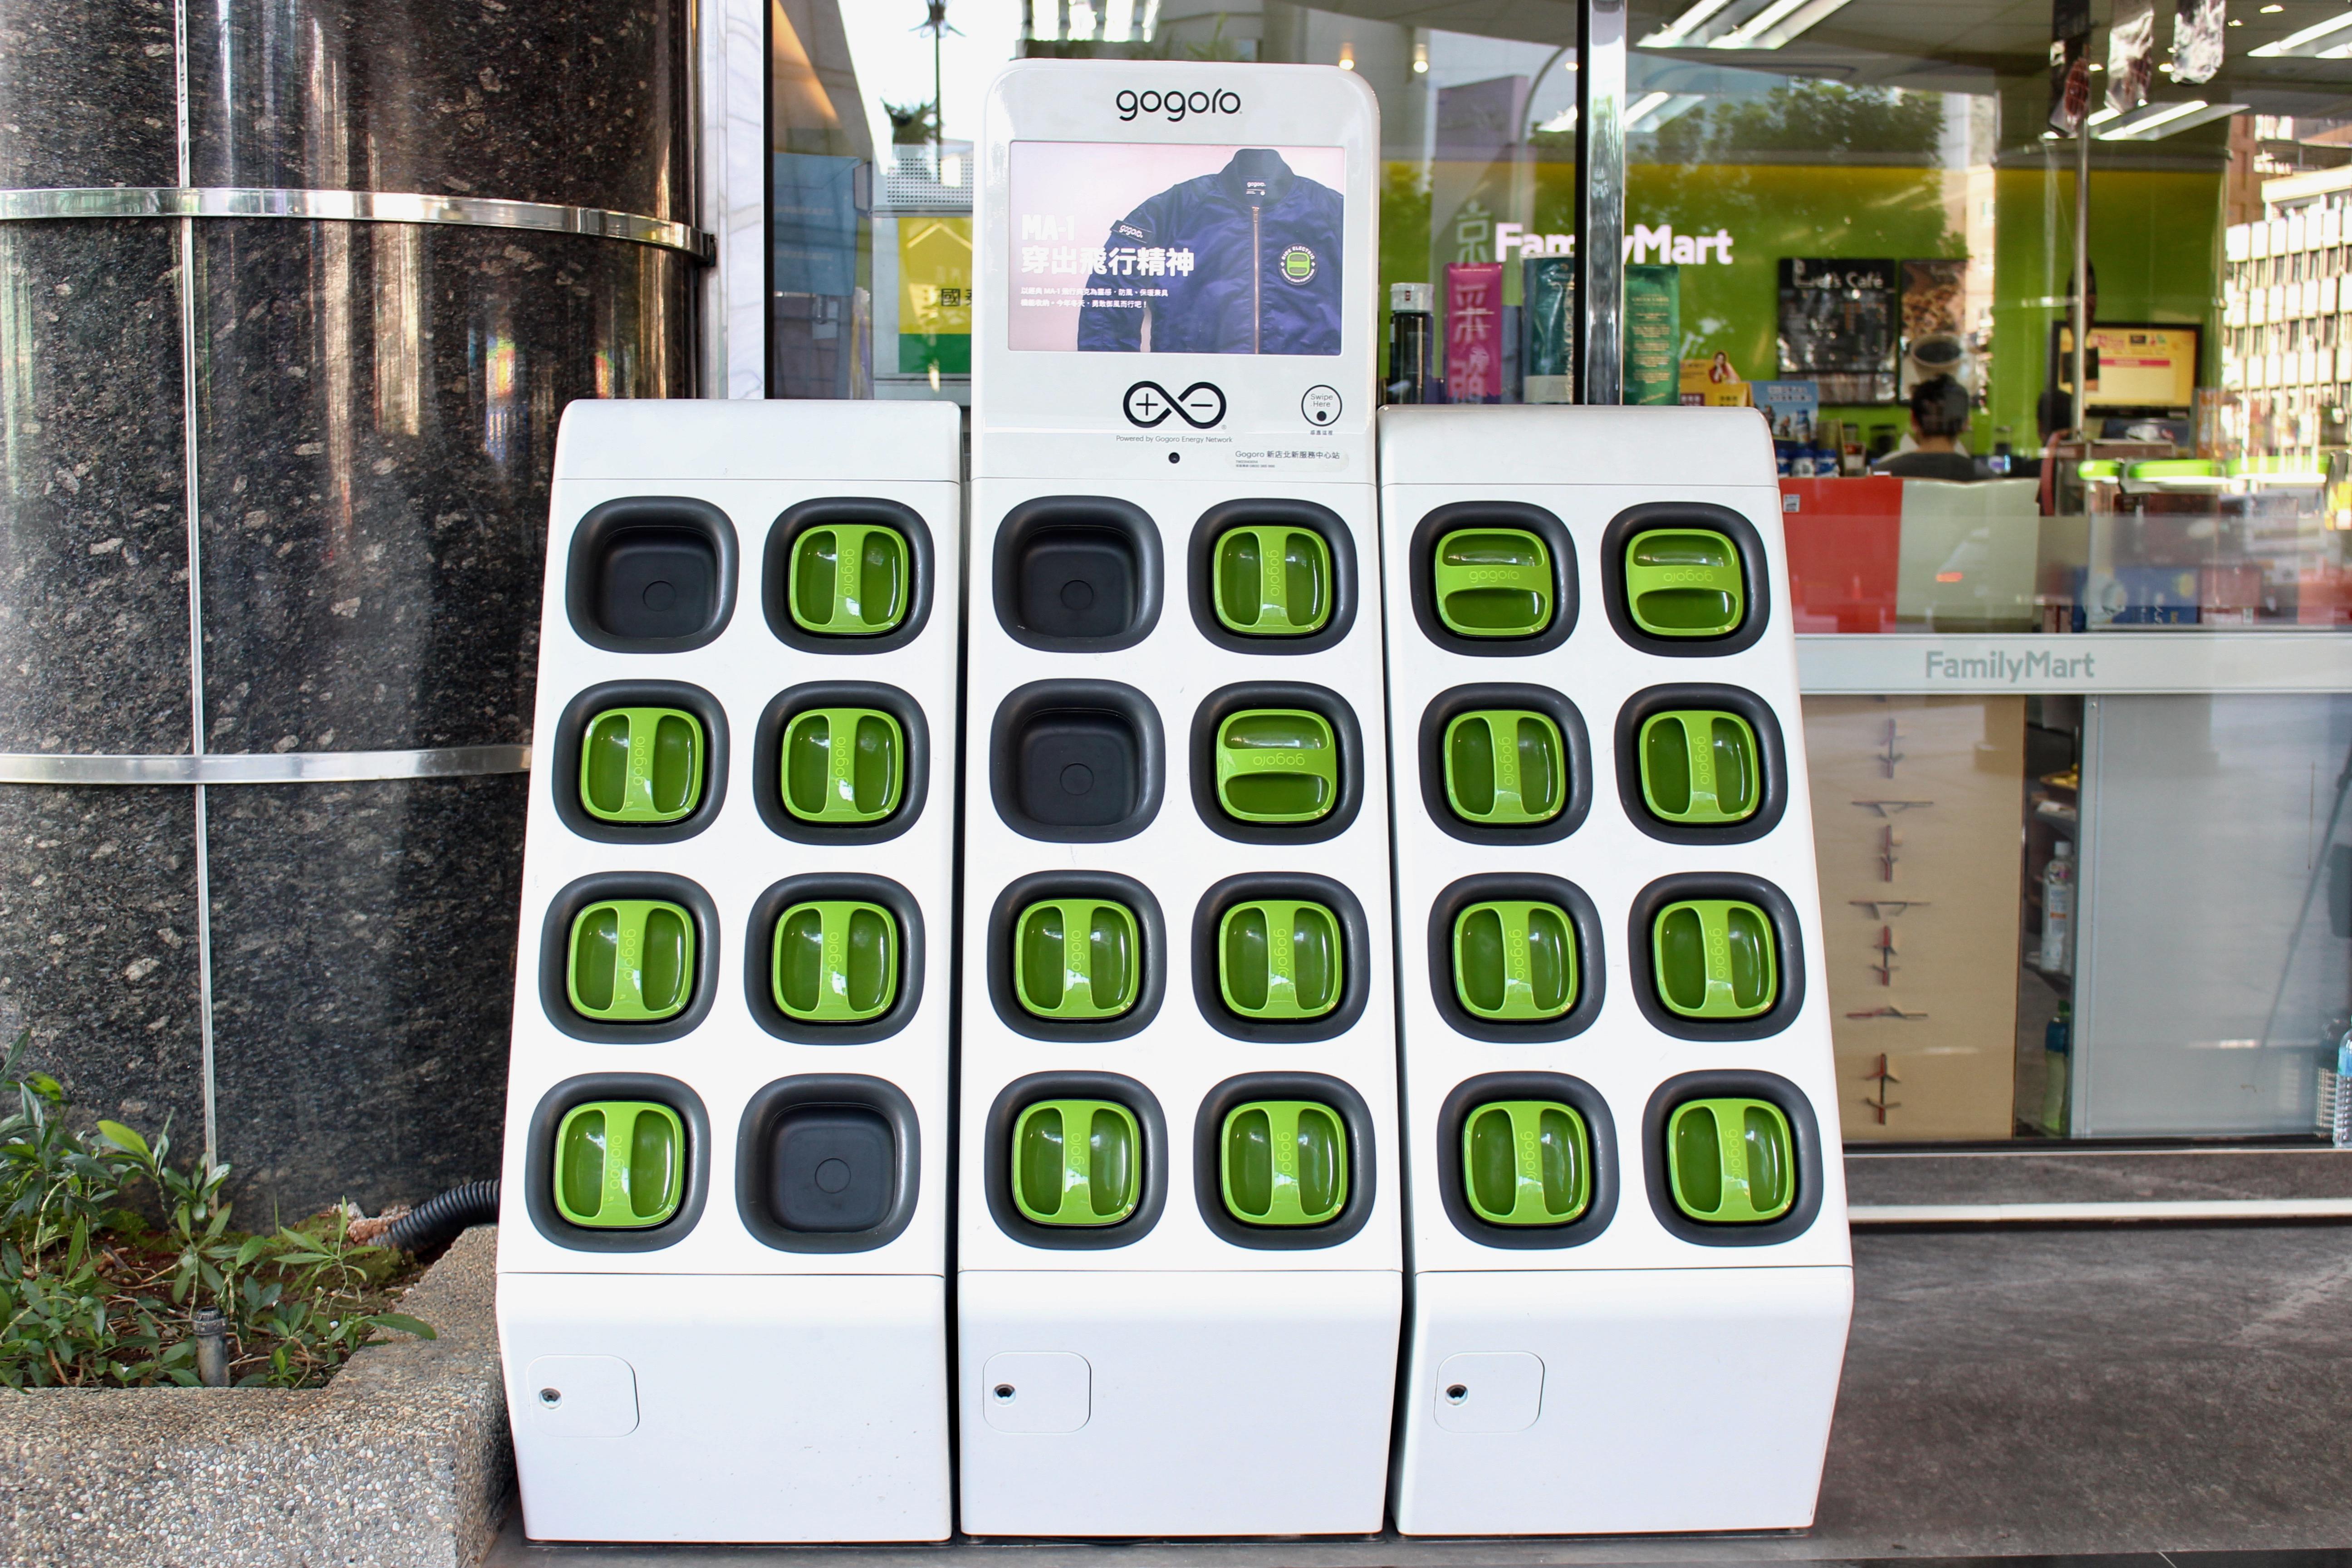 The charging station of gogoro. Photo/Hu, Fan(胡凡)